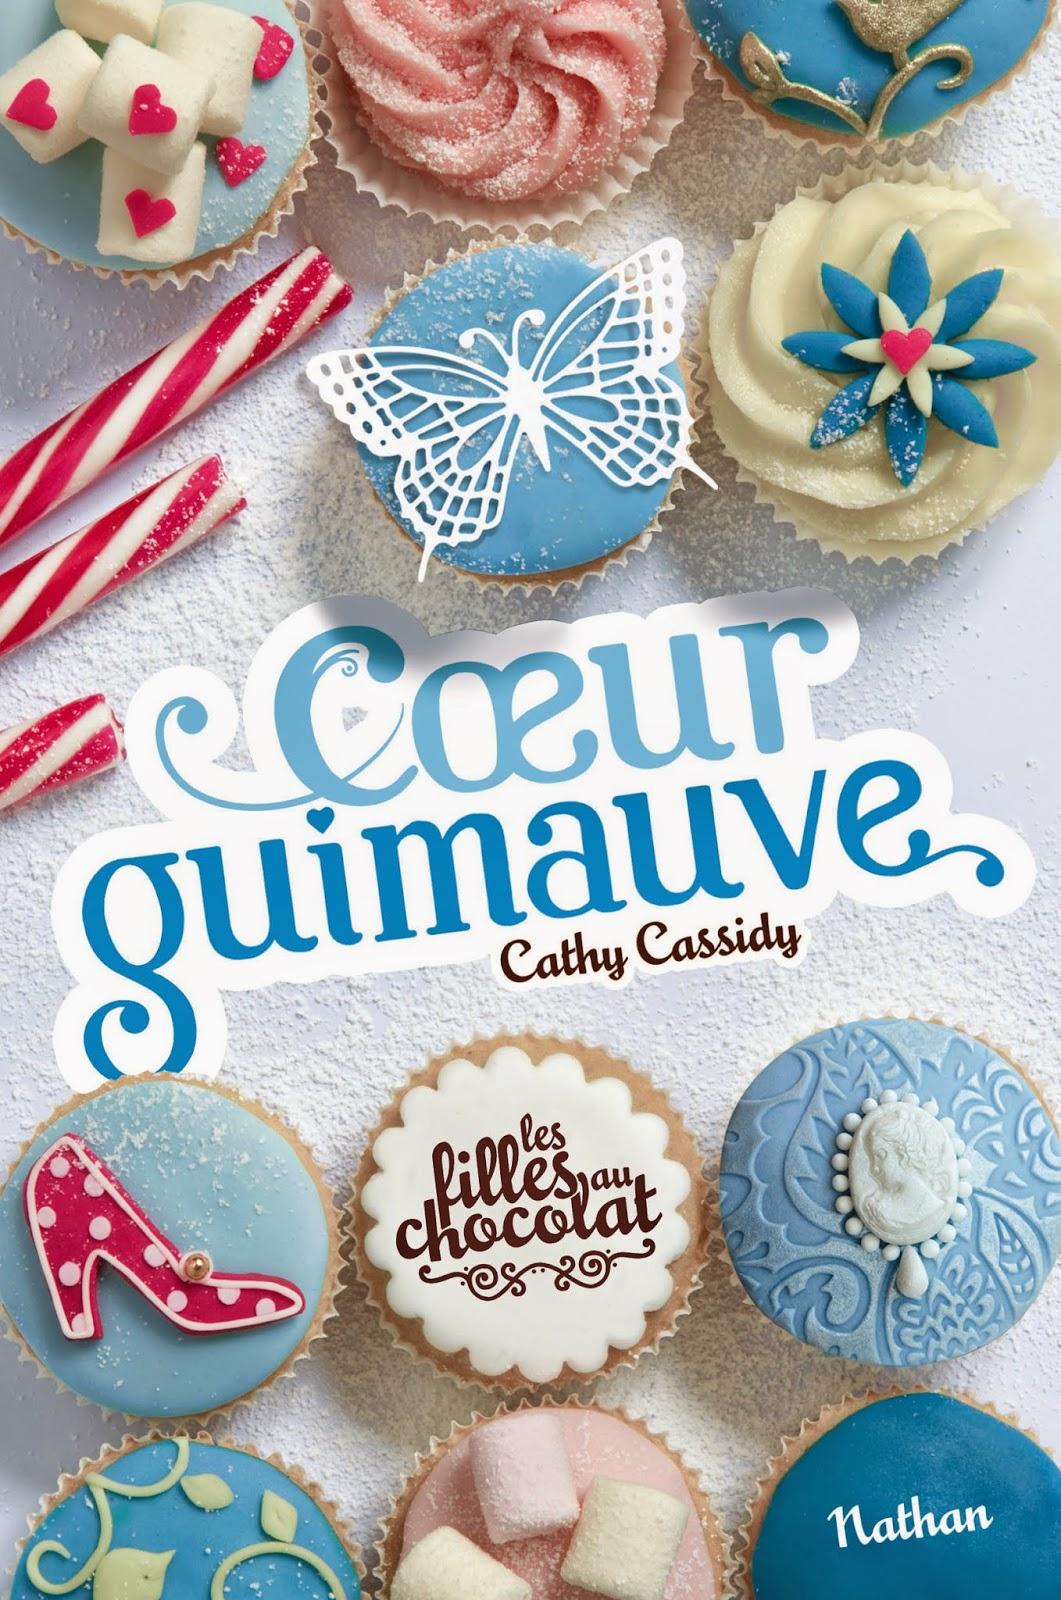 http://lesouffledesmots.blogspot.fr/2014/04/coeur-guimauve-cathy-cassidy.html